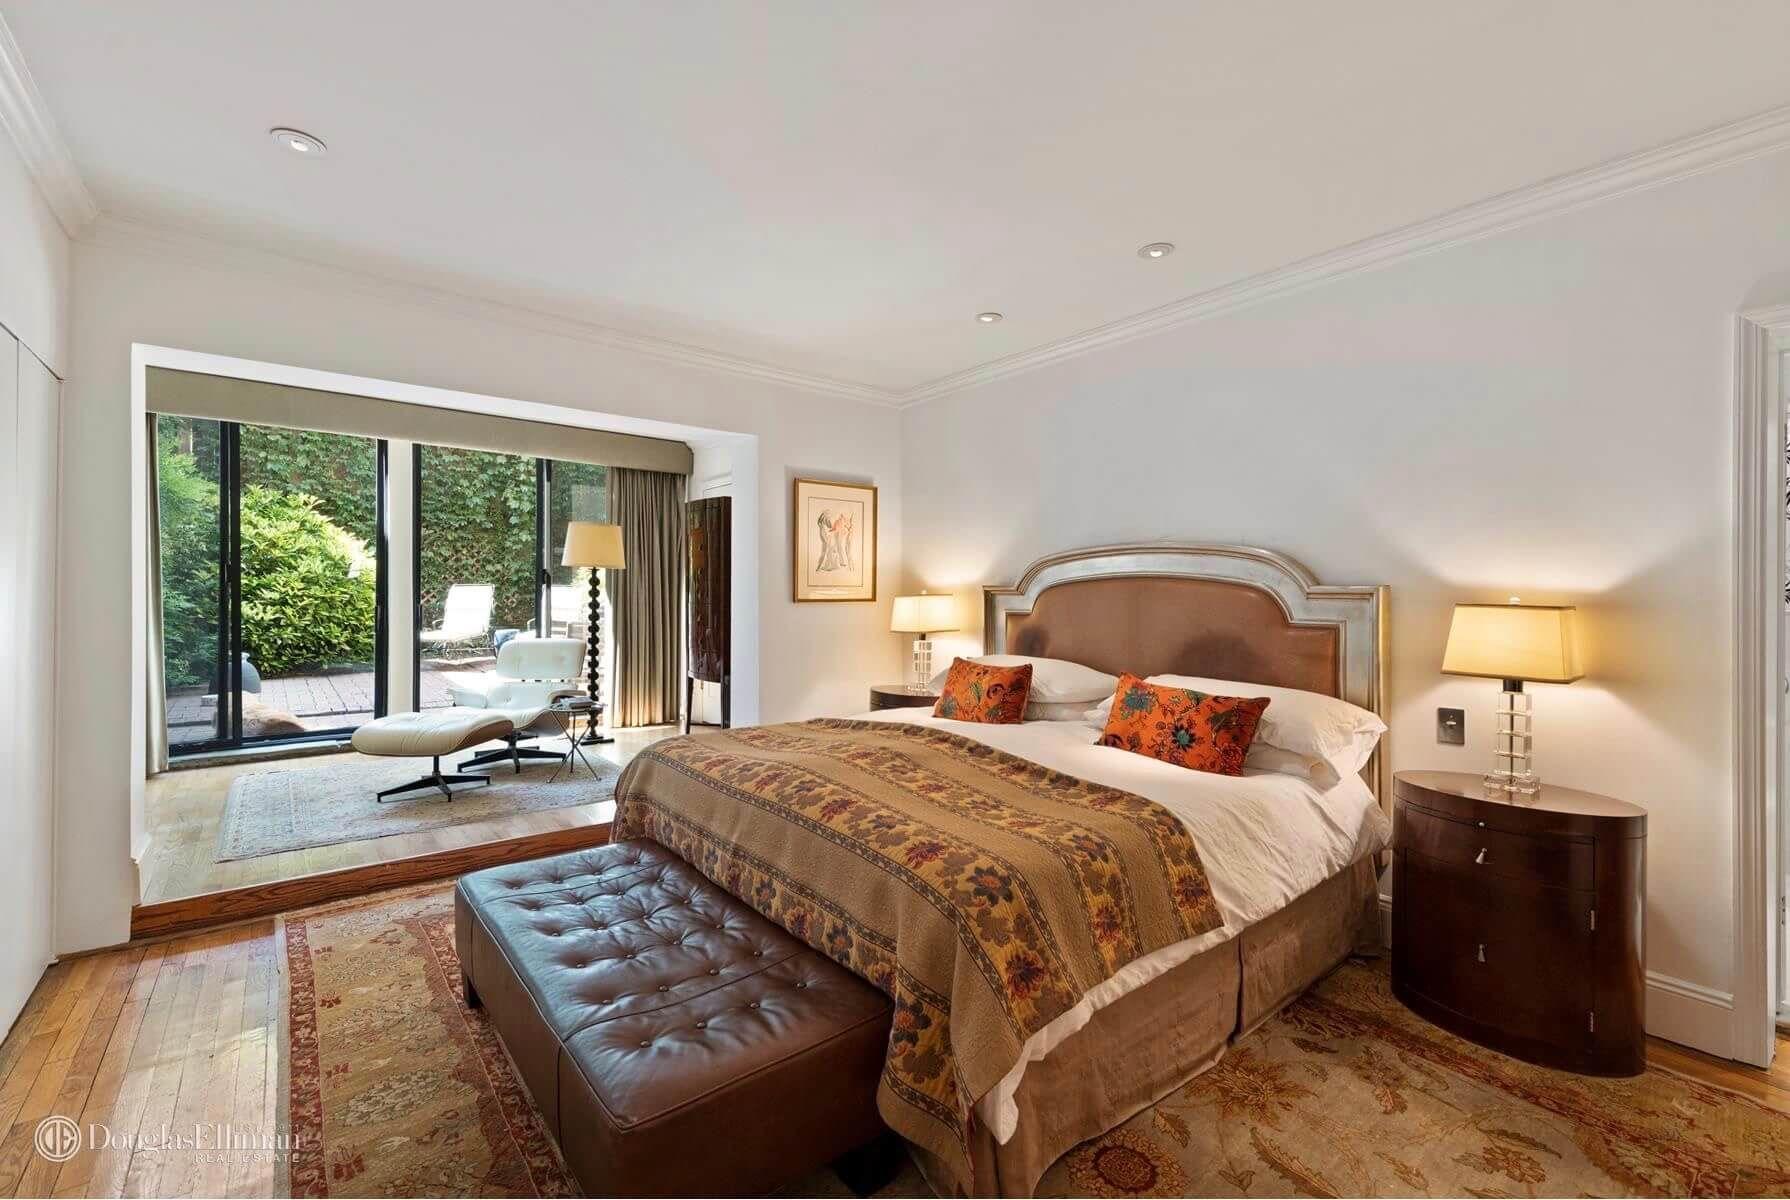 New York City Brooklyn Master bedroom and garden, 104